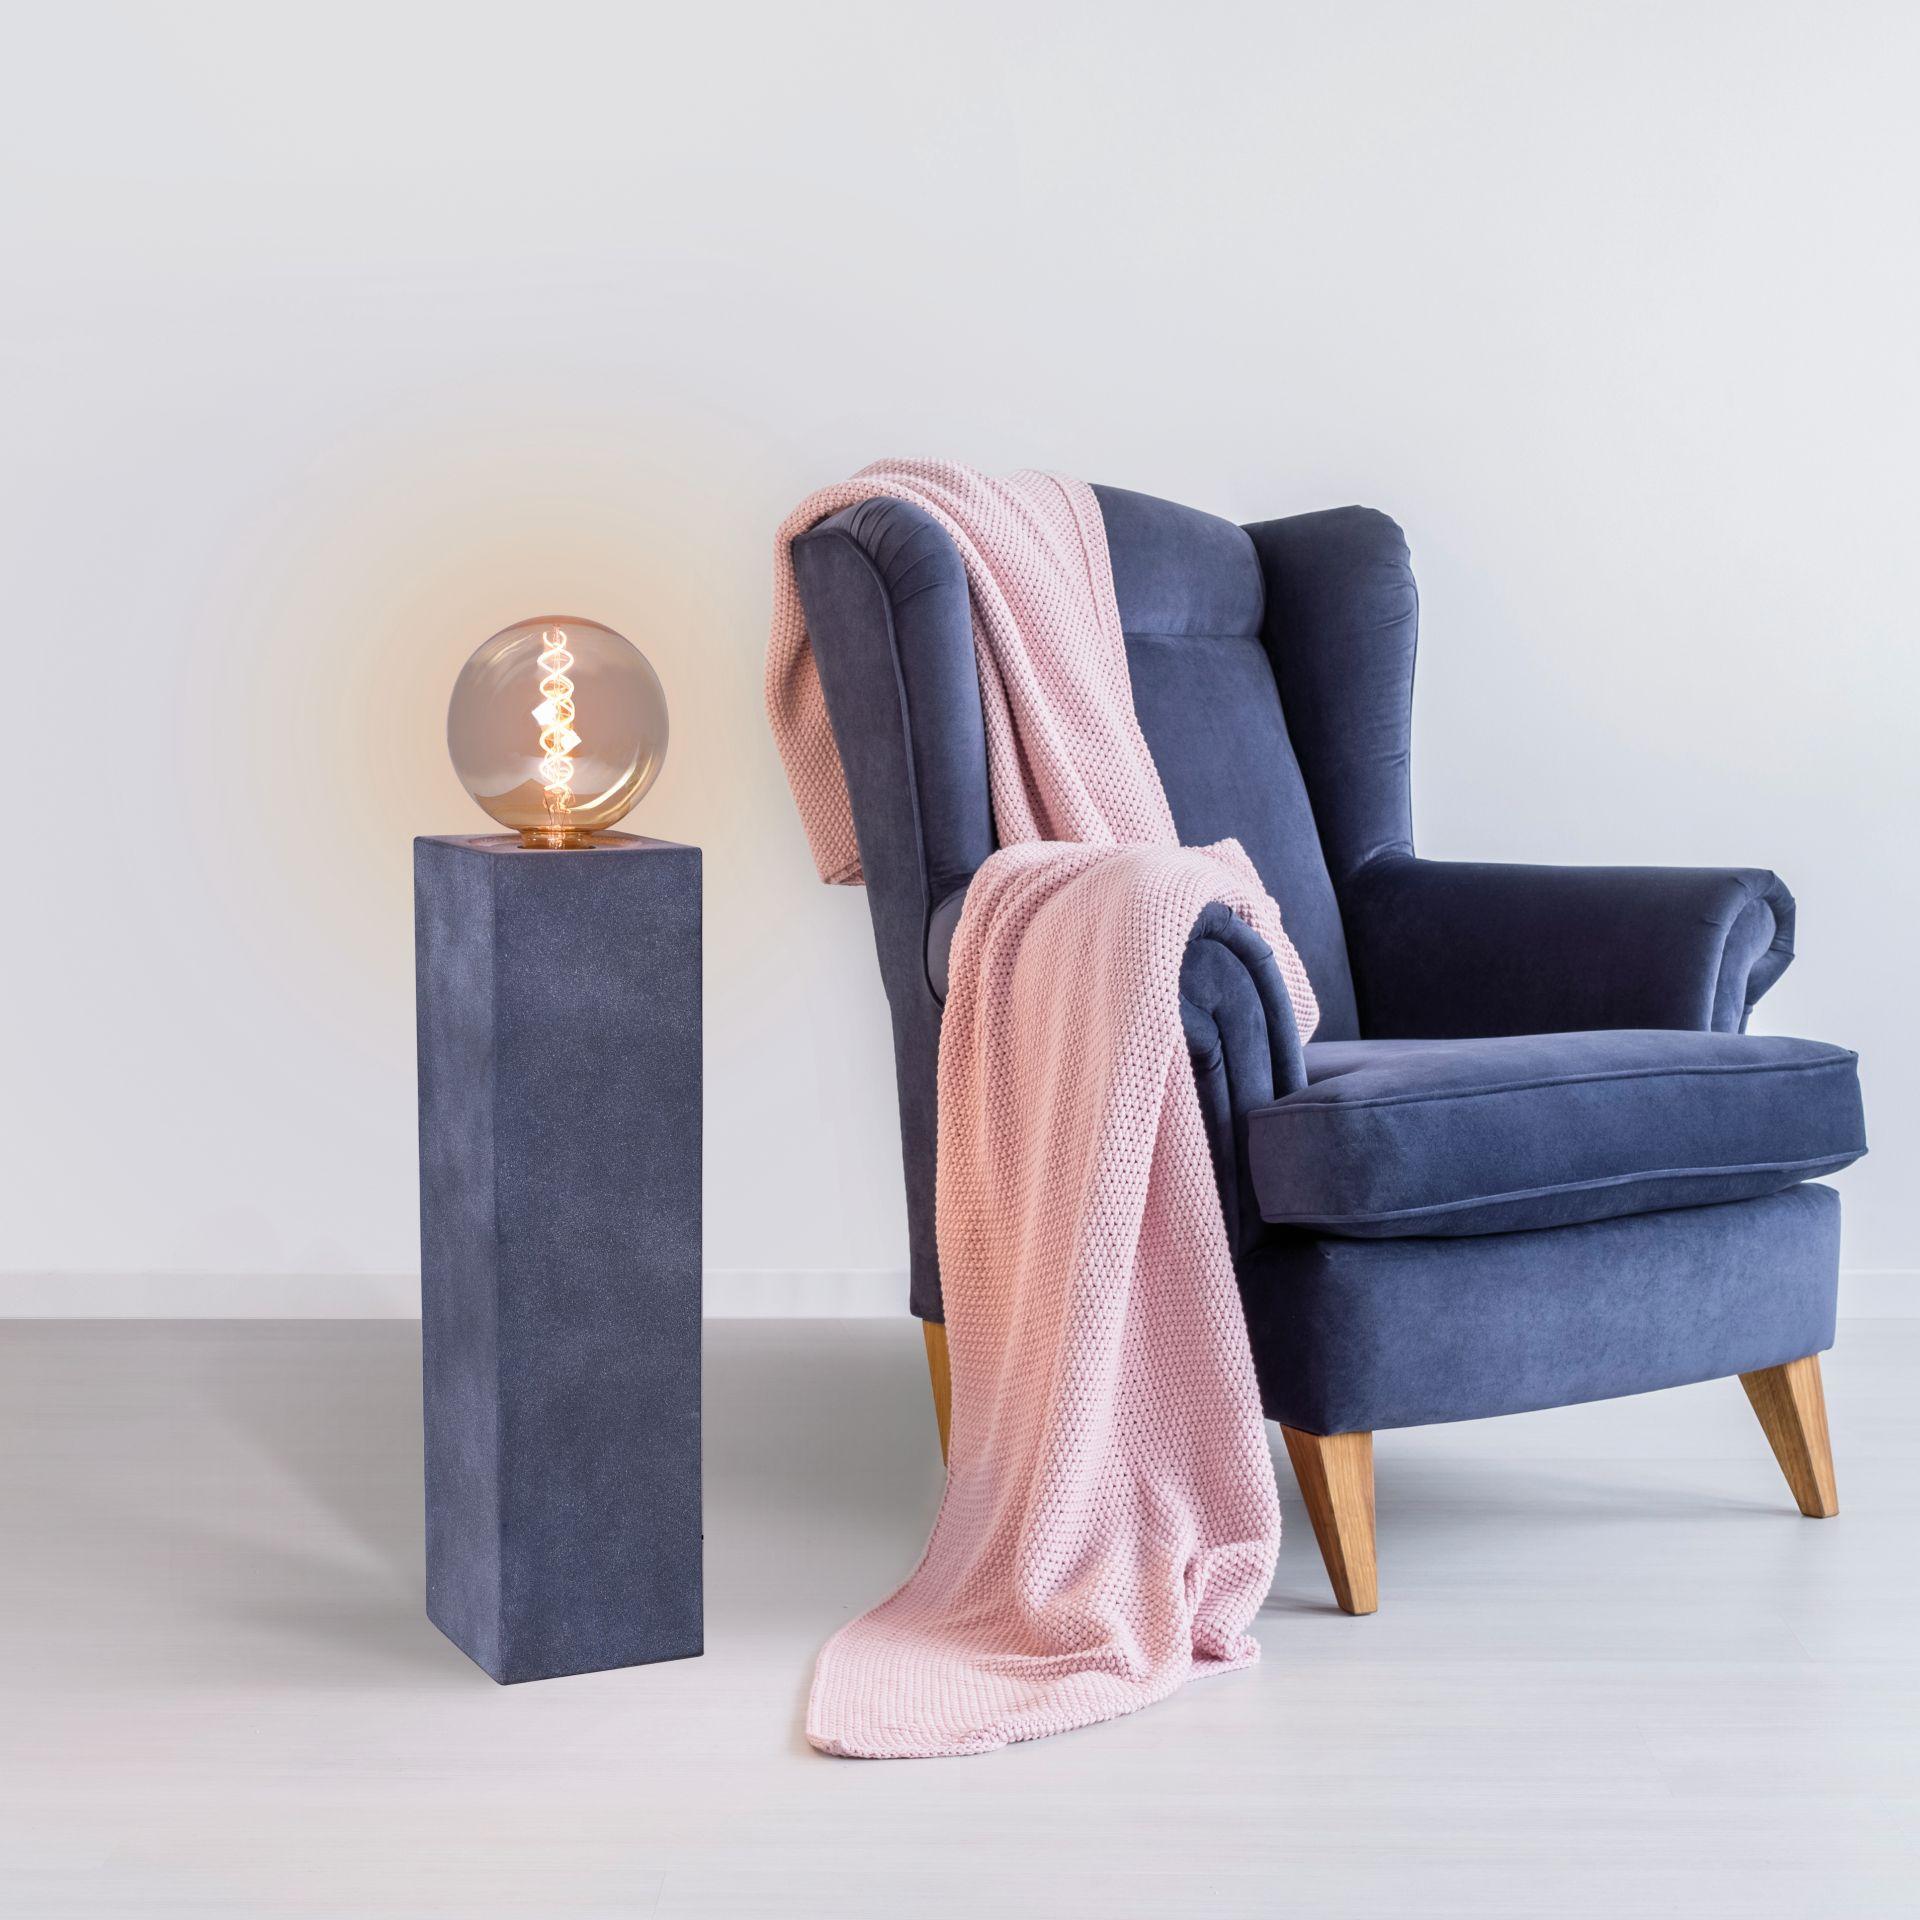 Design Lichtsäule Podestleuchte Podest Lampe Beton \